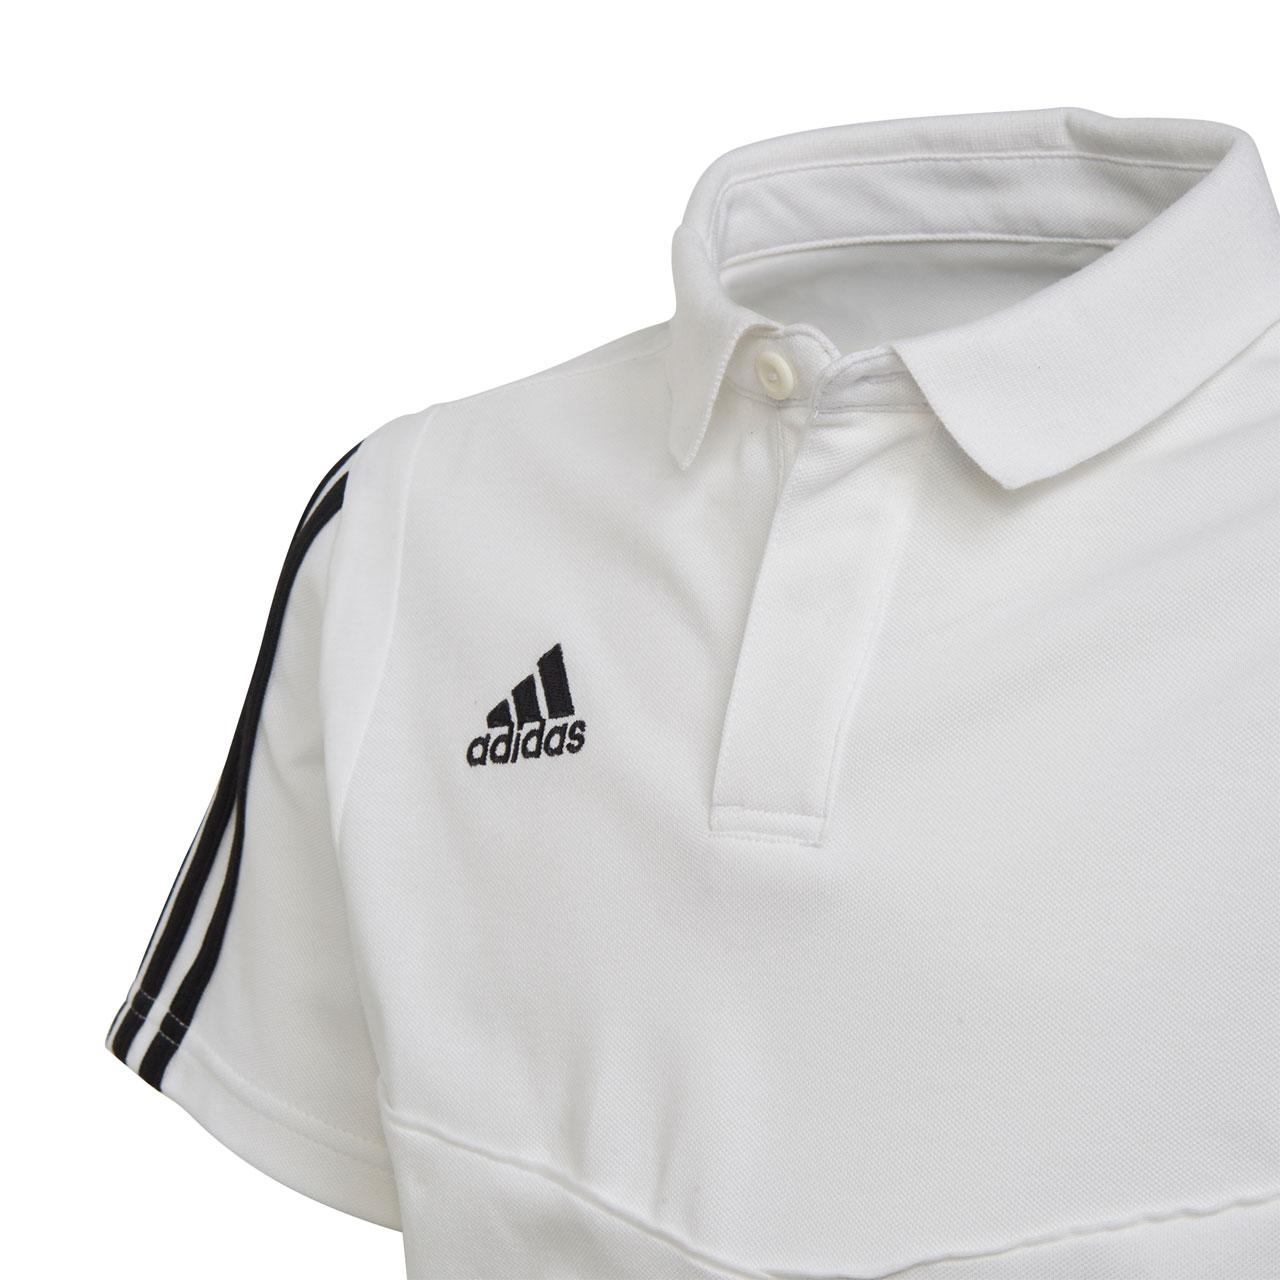 adidas Tiro 19 Kinder Cotton Polo Shirt